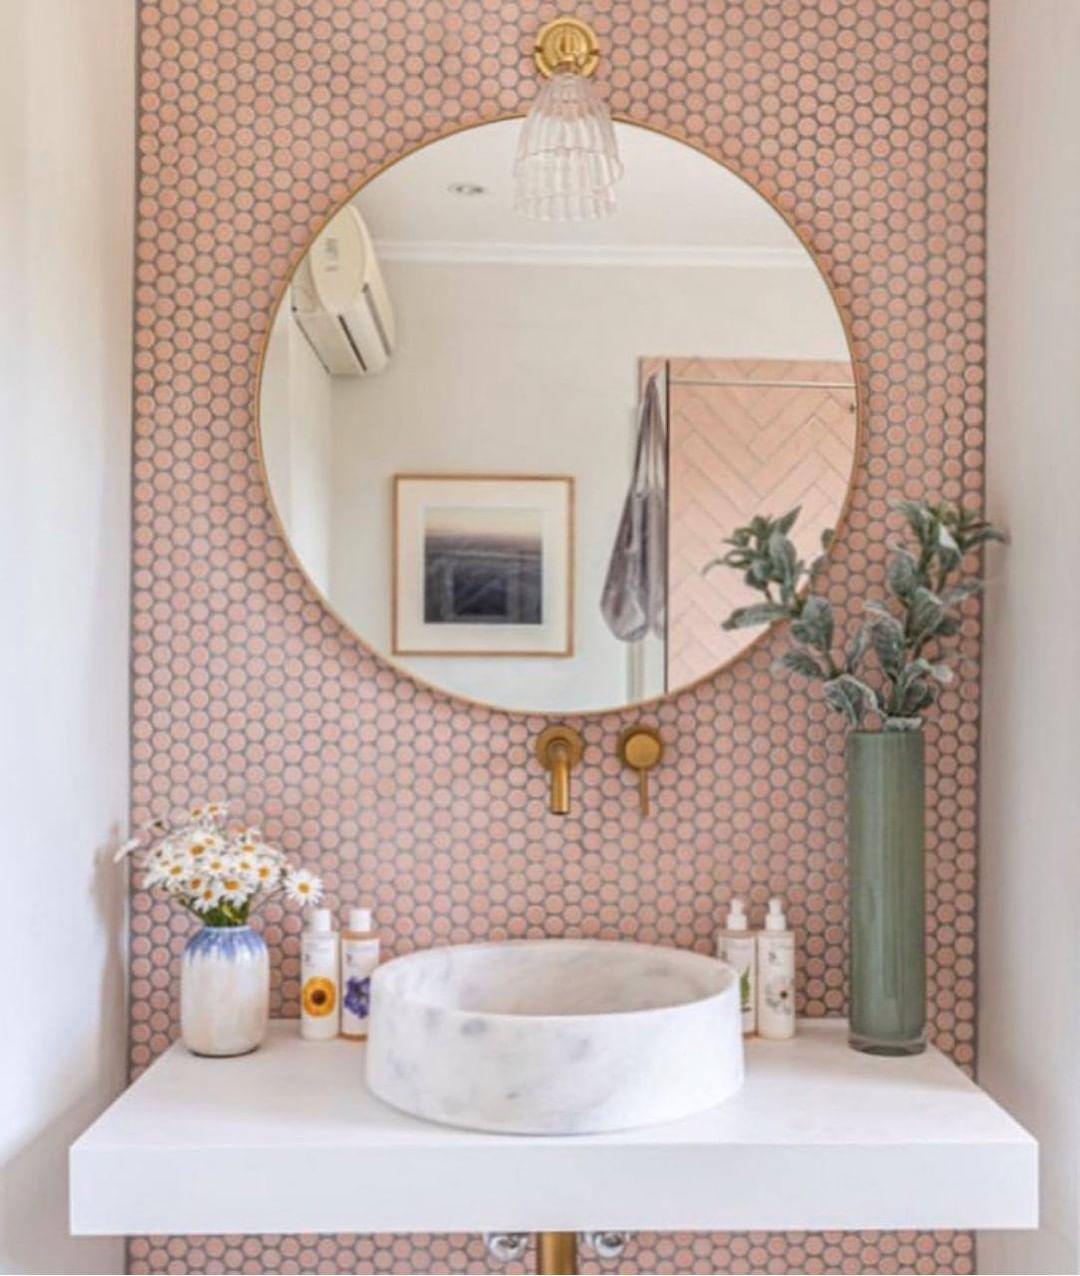 espelho redondo grande no lavabo